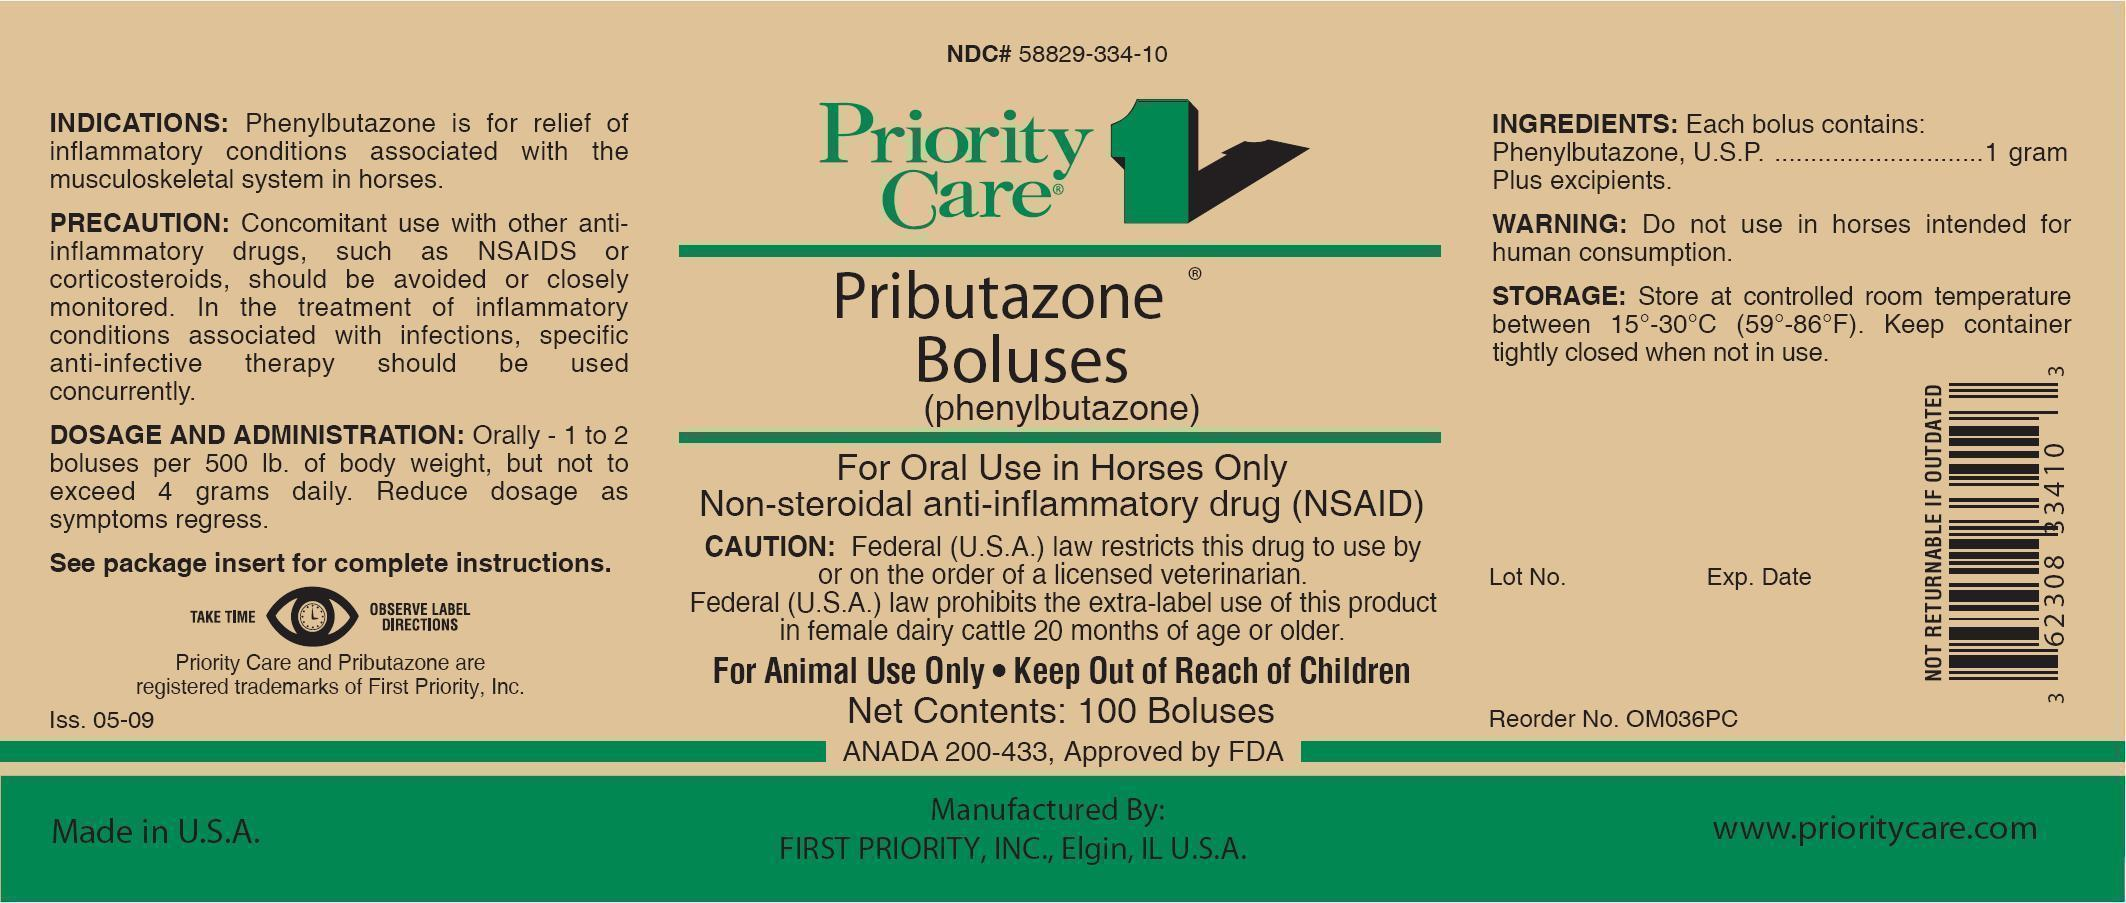 Pributazone (Phenylbutazone) Tablet [First Priority Incorporated]